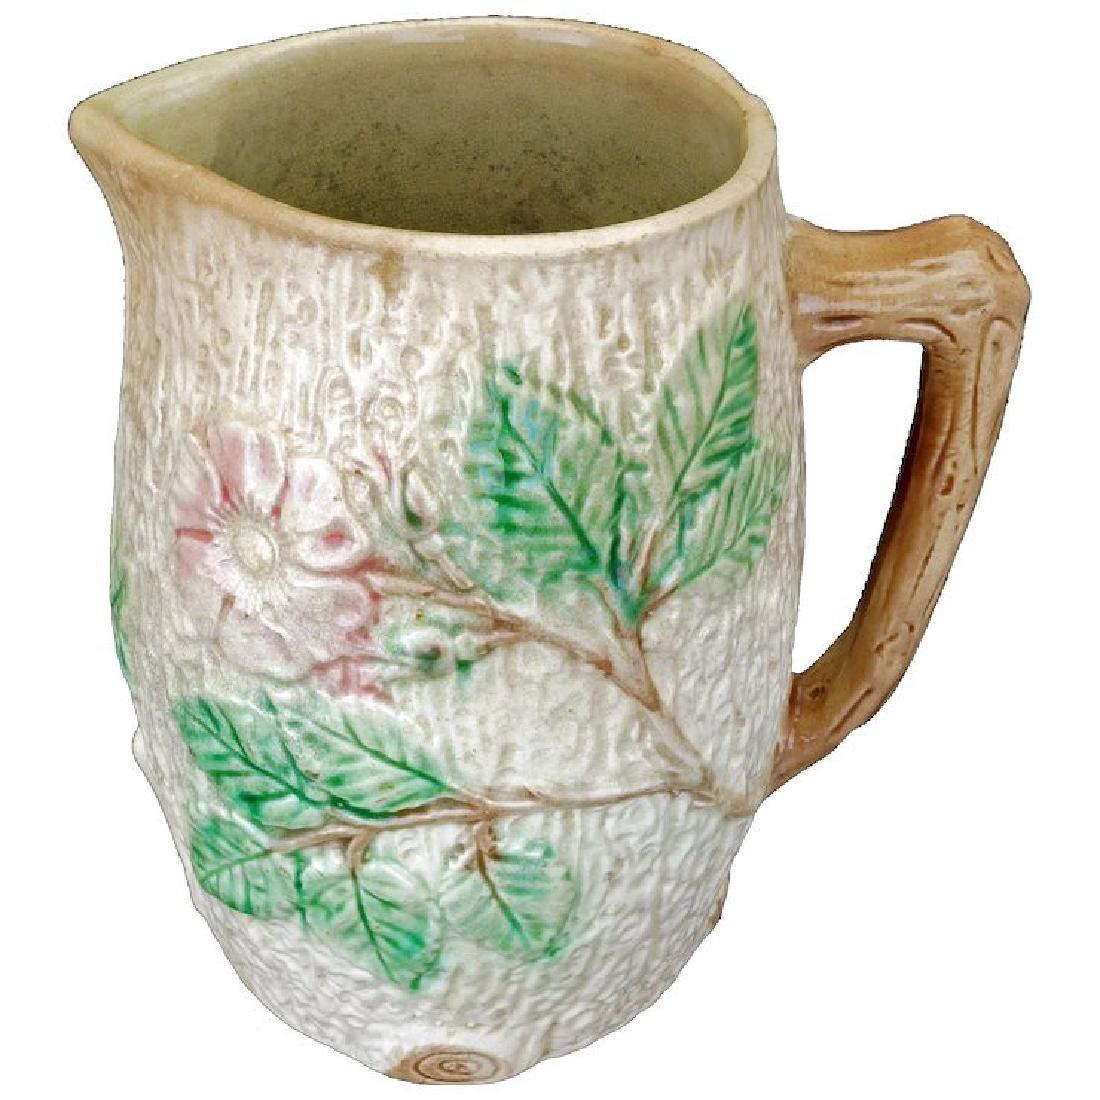 Ceramic majolica pitcher with apple blossom design